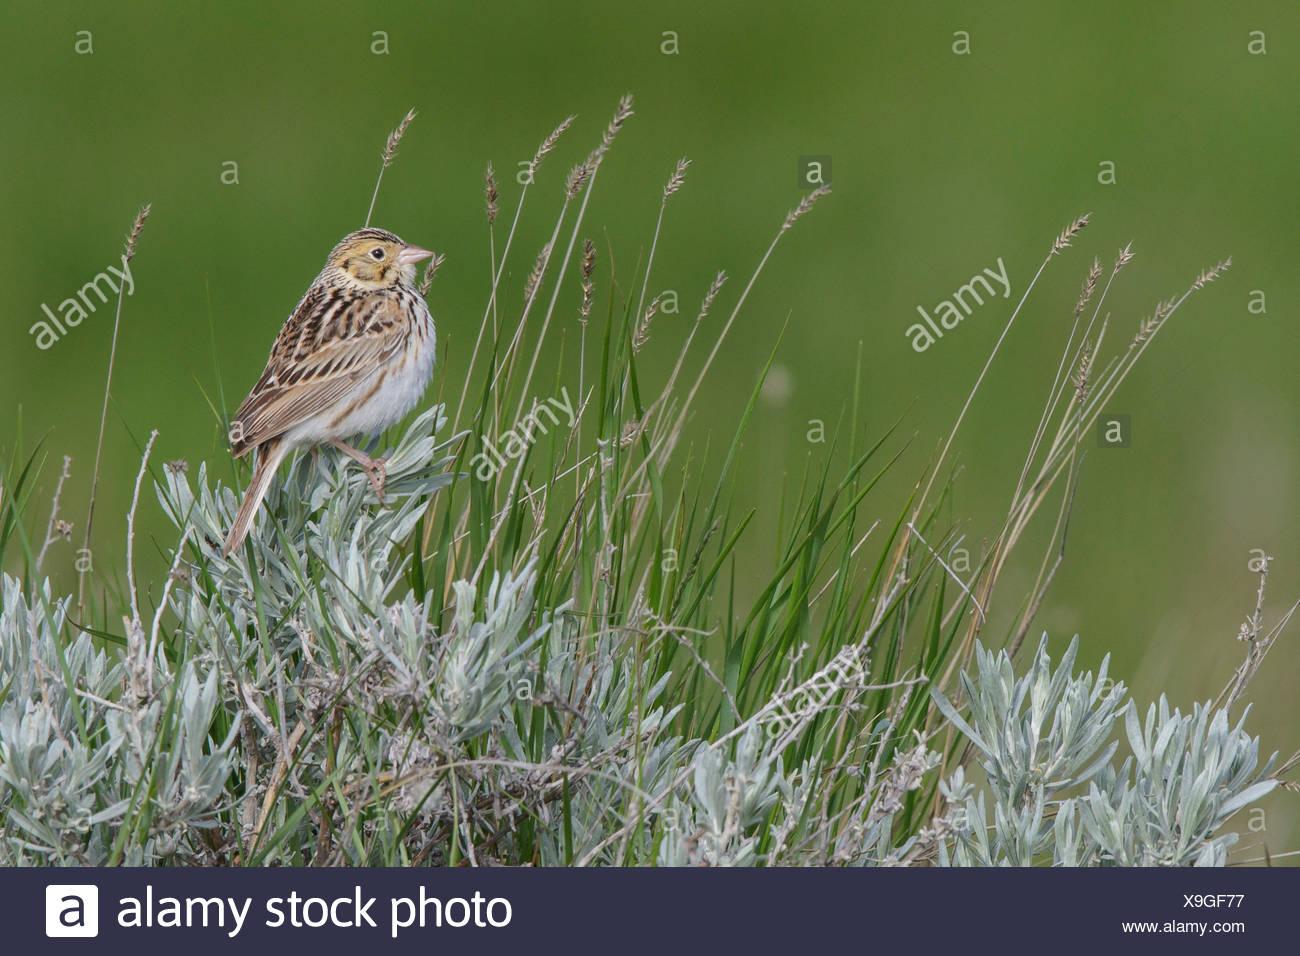 Baird's Sparrow (Ammodramus bairdii) perched on a branch in Alberta, Canada. - Stock Image